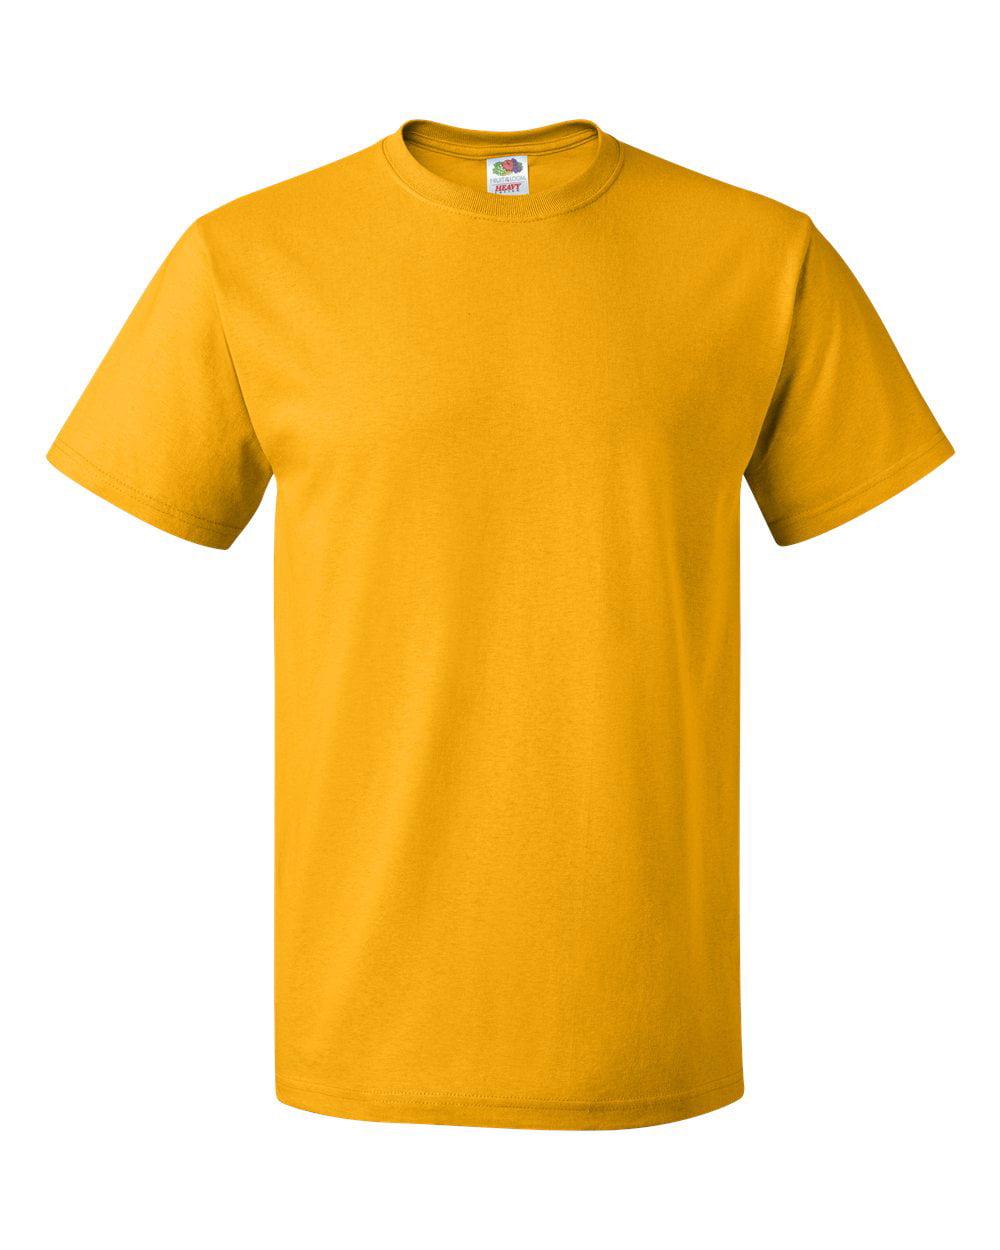 Fruit Of The Loom Mens HD Cotton Short Sleeve Crew T-Shirt, 2XL, Violet